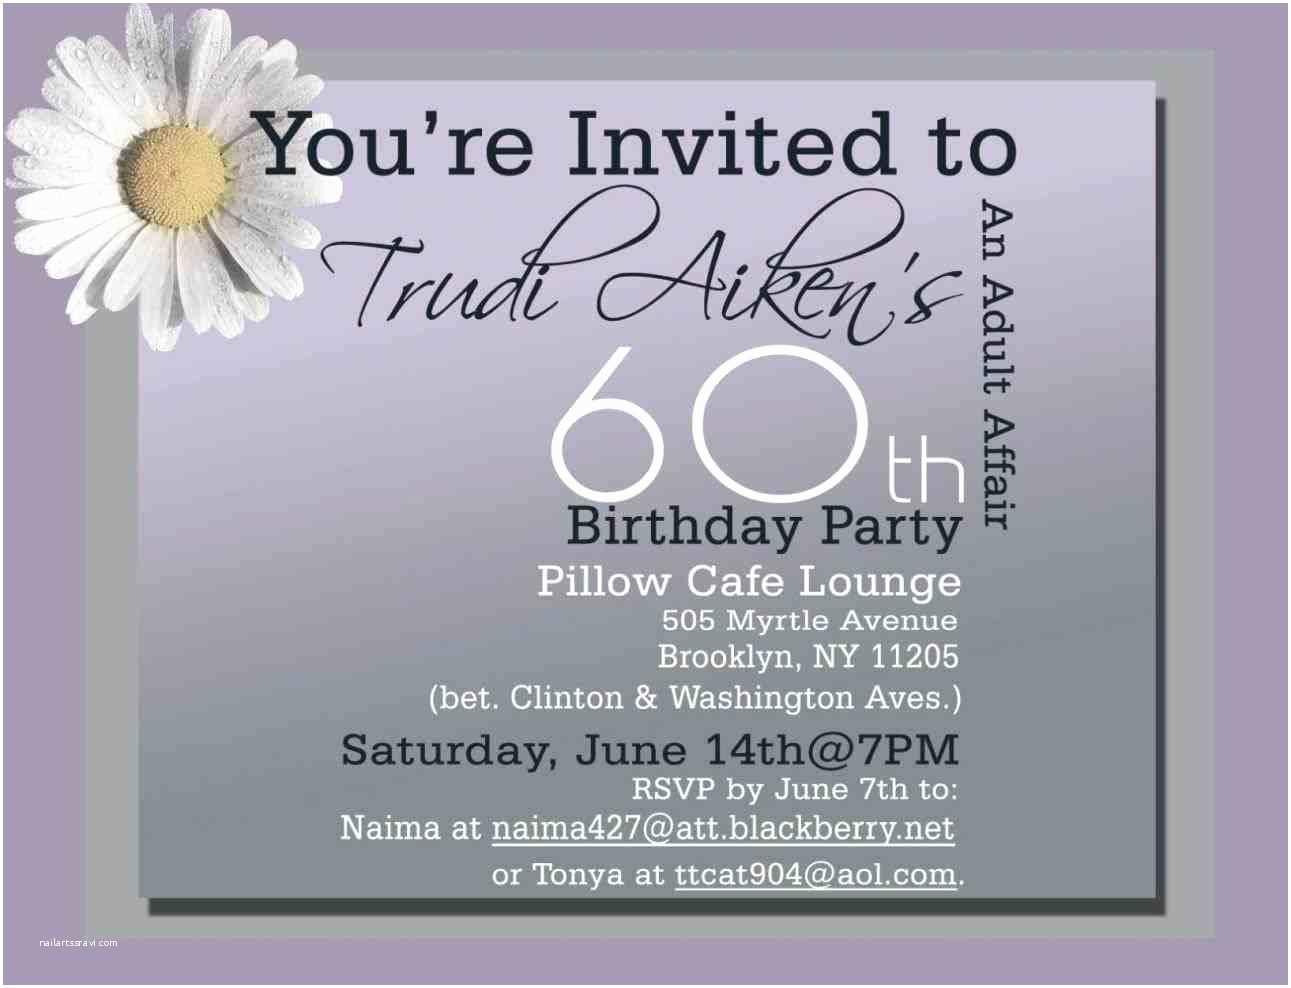 Elegant Party Invitations Free Elegant Birthday Invitation Templates